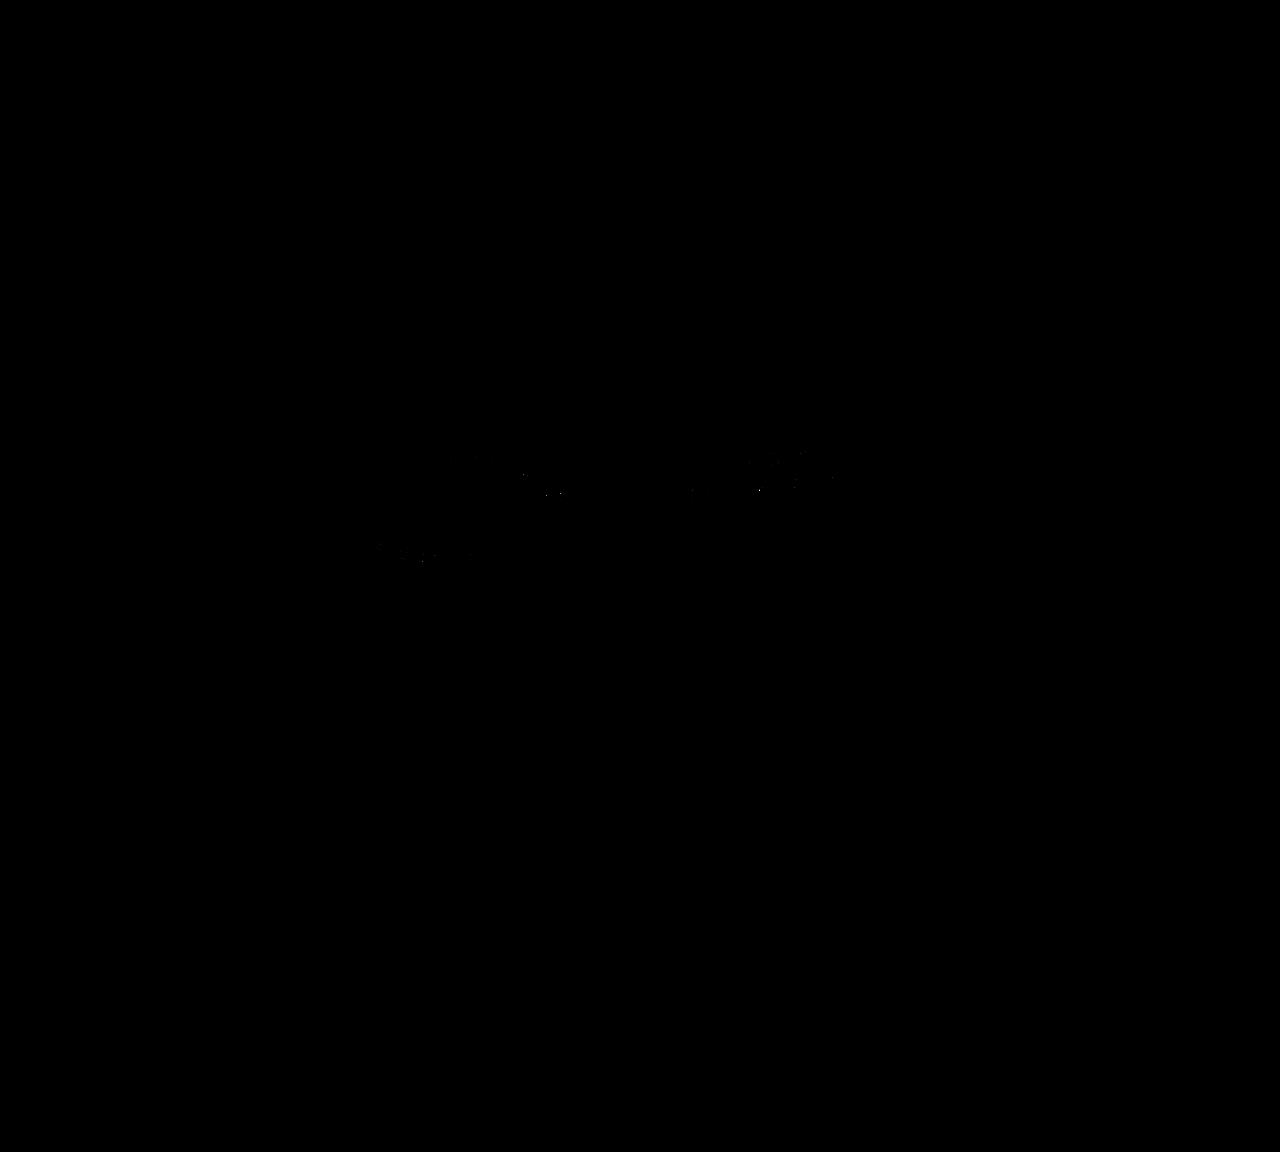 307722587013509778 together with Imagens Do Naruto Shippuden Para Colorir E Imprimir further Naruto Gaiden The Seventh Hokage Sarada Sharingan 537221540 likewise Son Goku 4 Lineart 729140339 together with Characters. on sasuke drawing